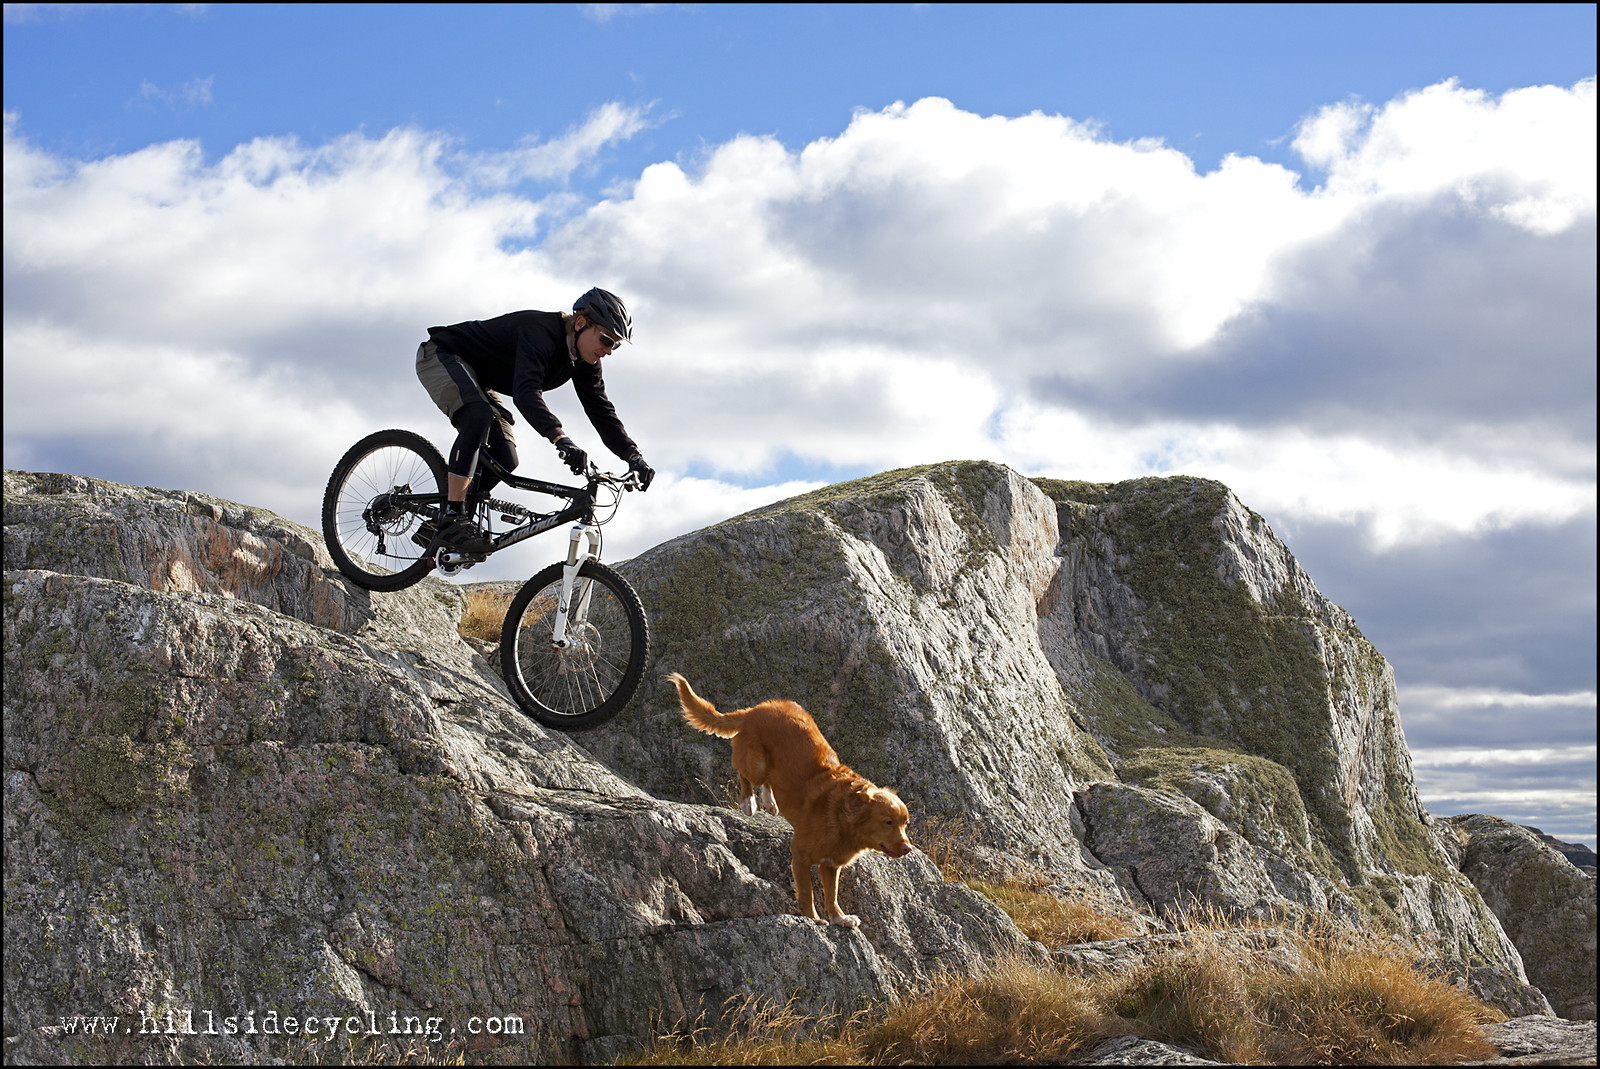 Best Friends - Hillside Cycling - Mountain Biking Pictures - Vital MTB